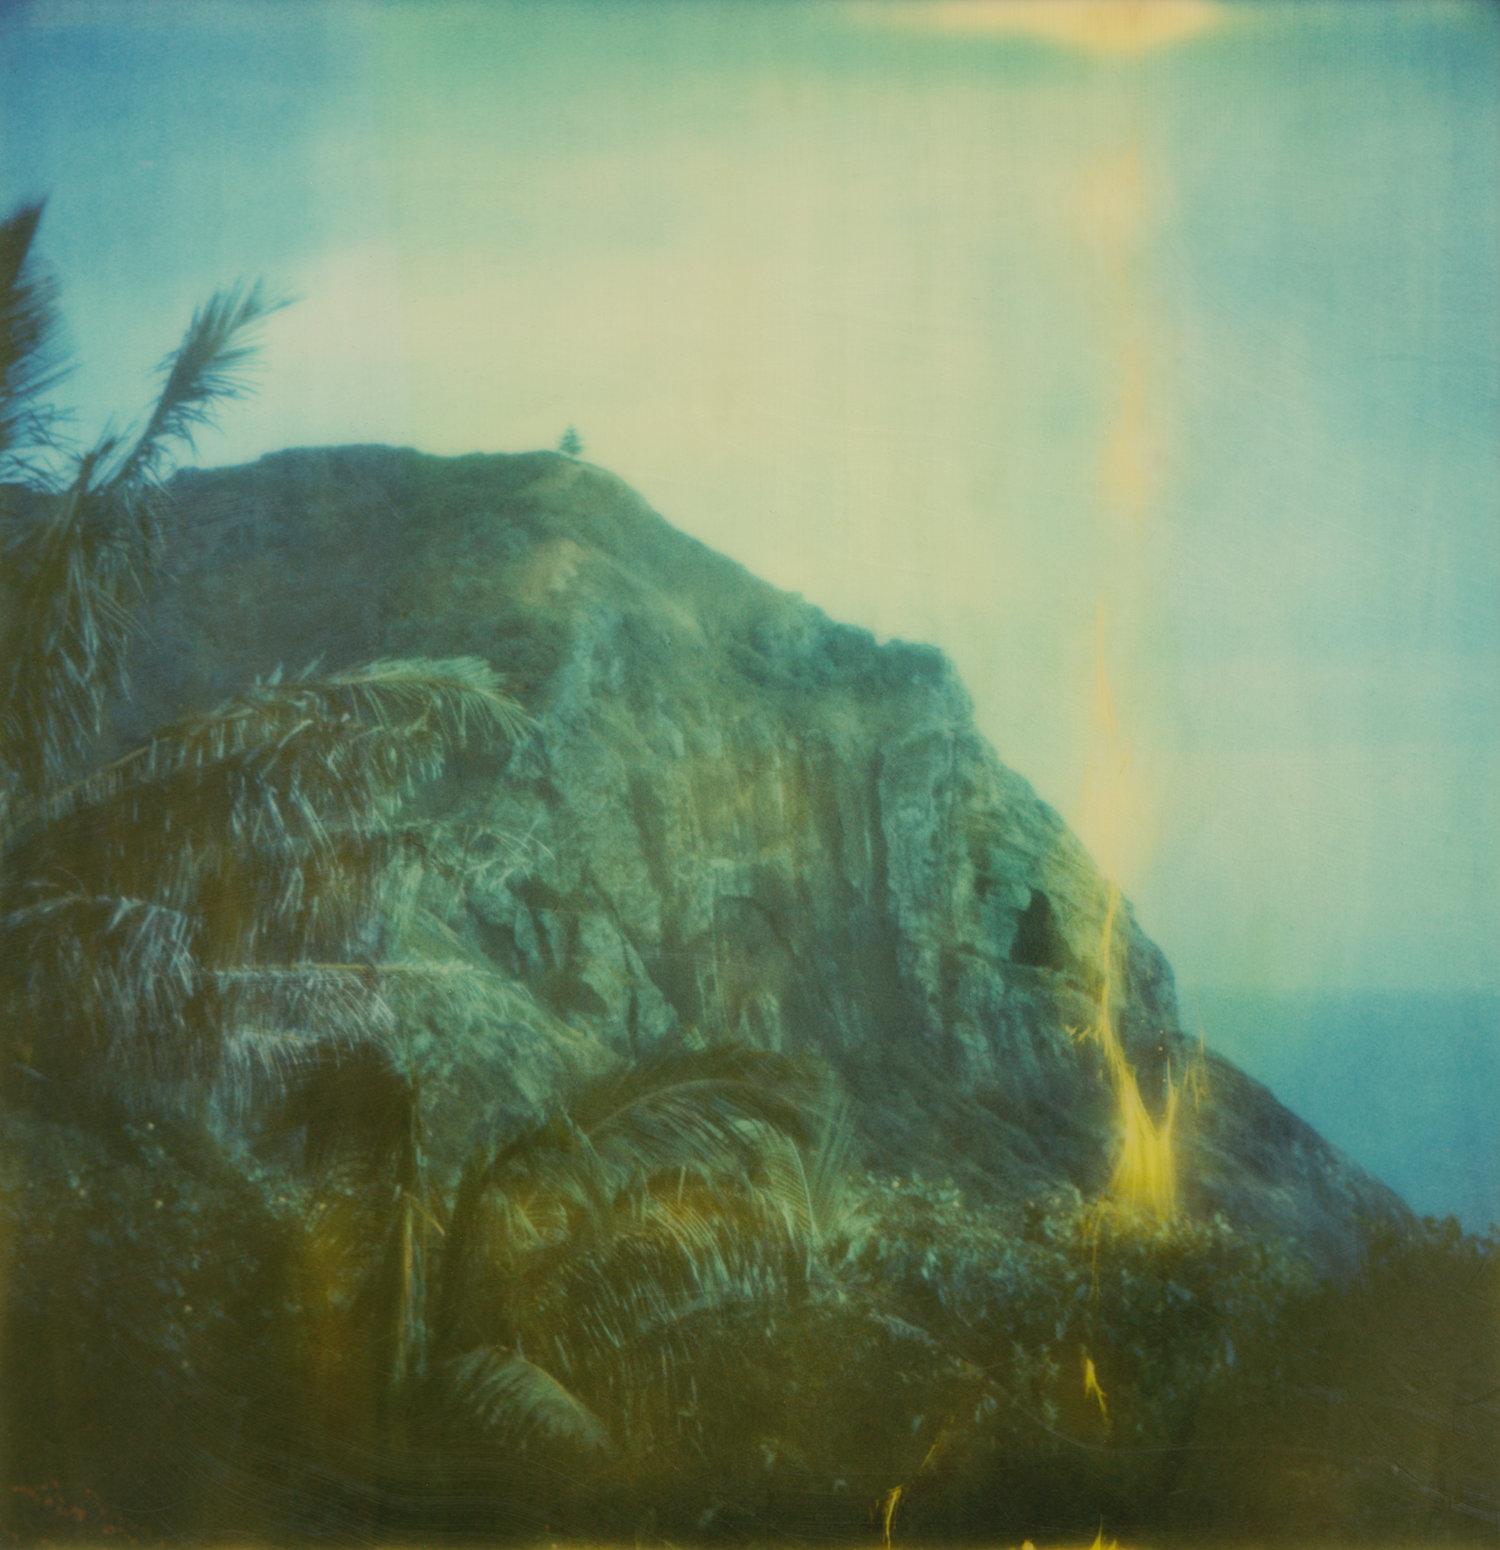 Christian's Cave, The Omniscient Eye © Rhiannon Adam